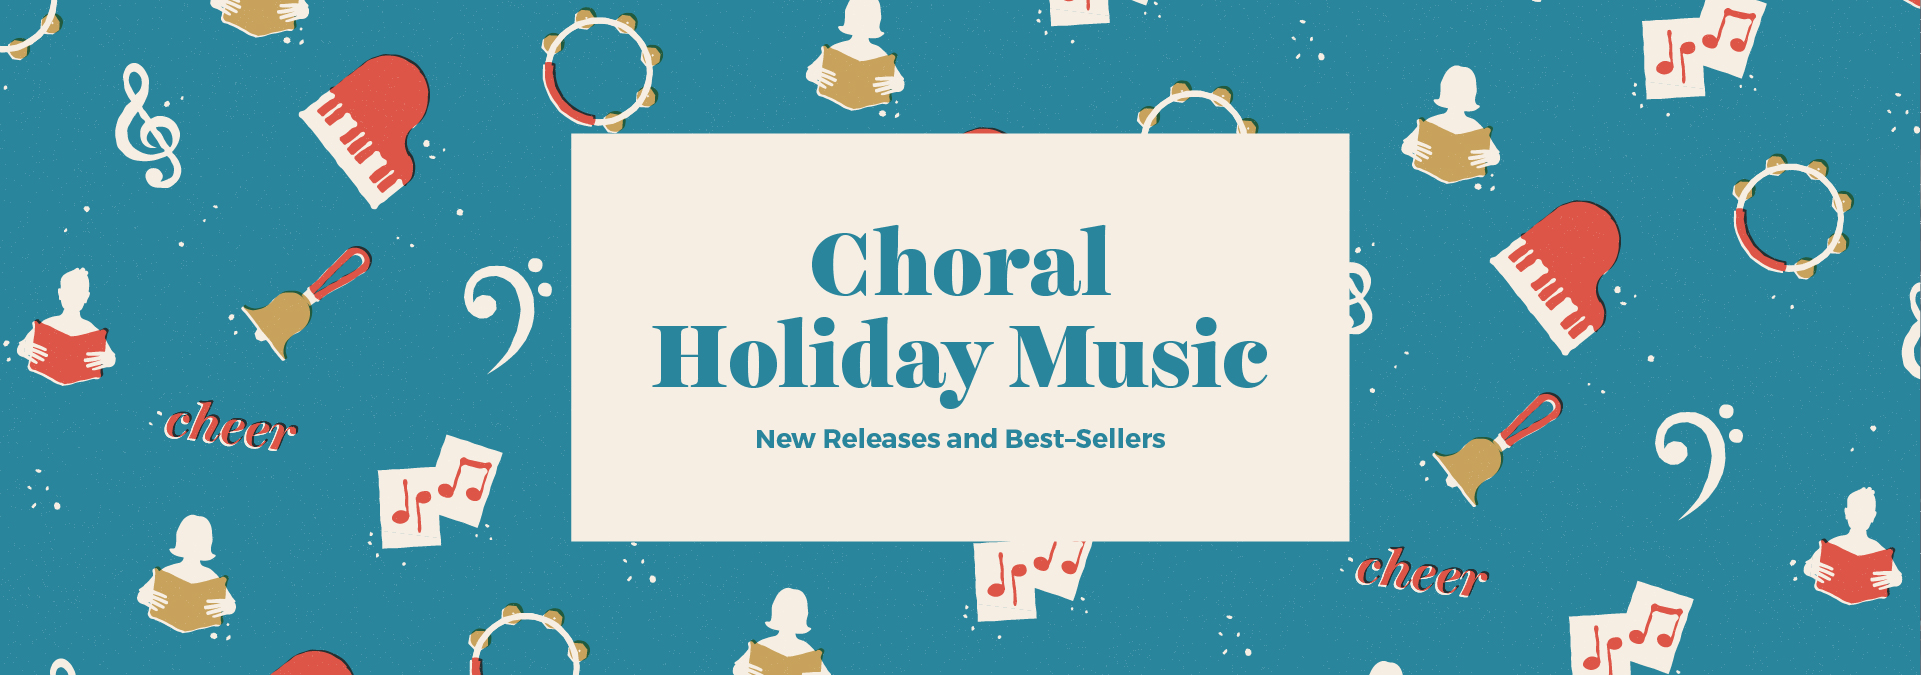 Choral Holiday Music